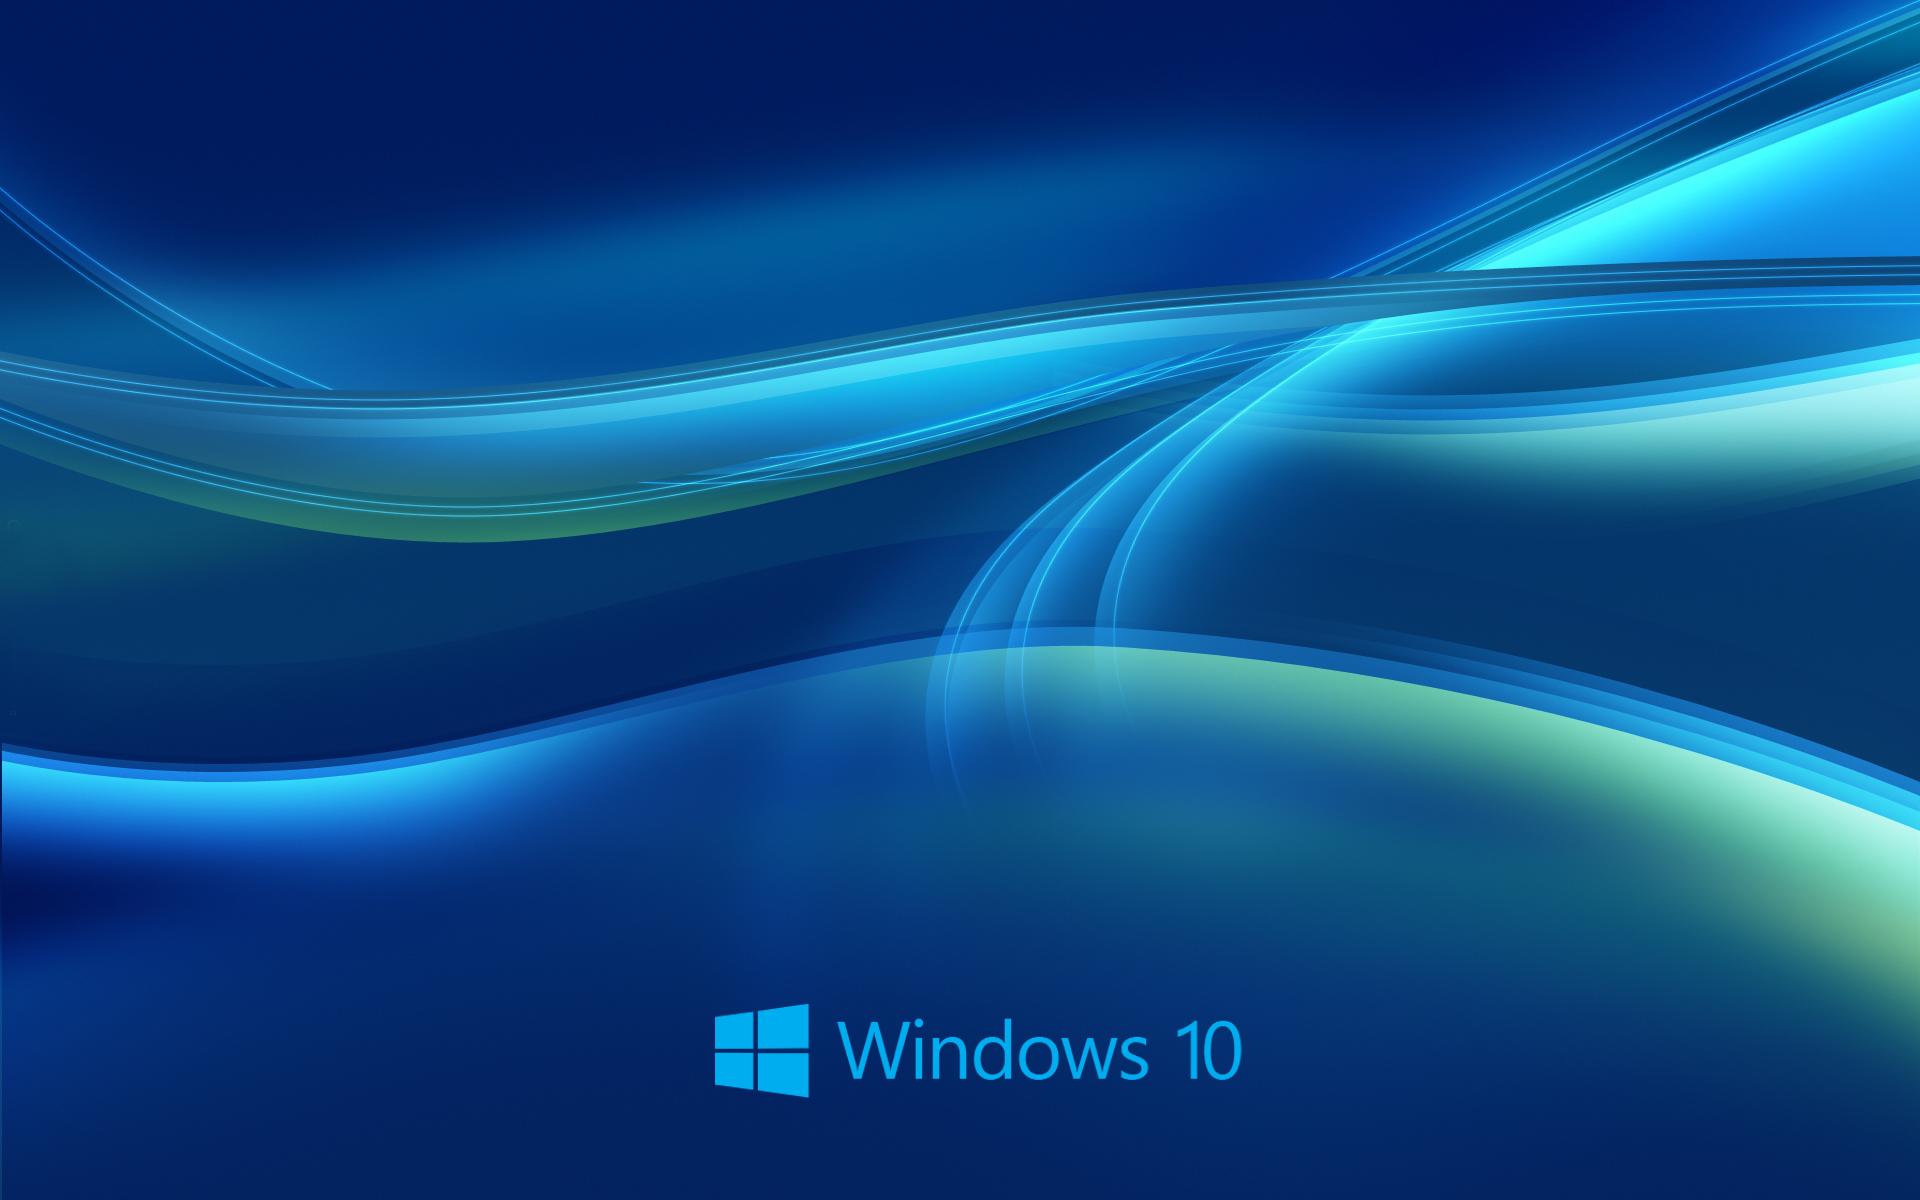 windows 10 wallpaper download,blue,aqua,light,azure,electric blue